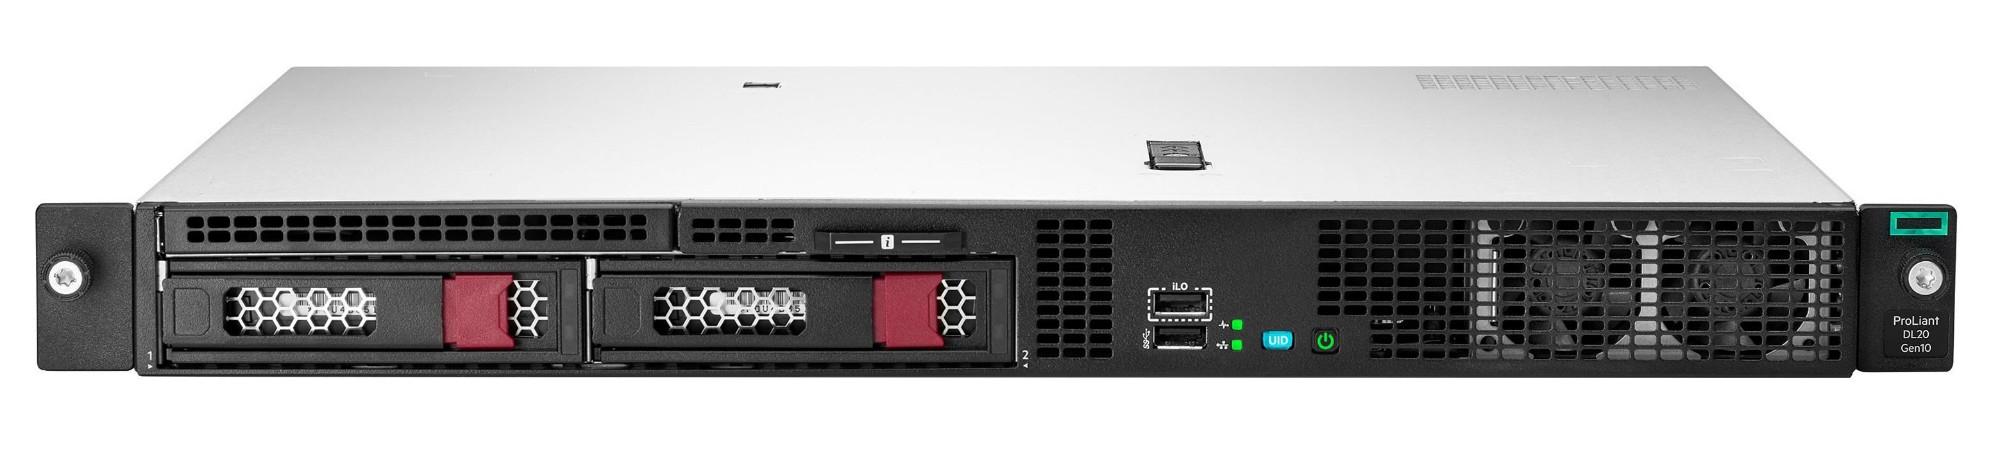 Hewlett Packard Enterprise ProLiant DL20 Gen10 + Windows Server 2019 Standard ROK servidor Intel® Pentium® 3,8 GHz 8 GB DDR4-SDRAM 24 TB Bastidor (1U) 290 W